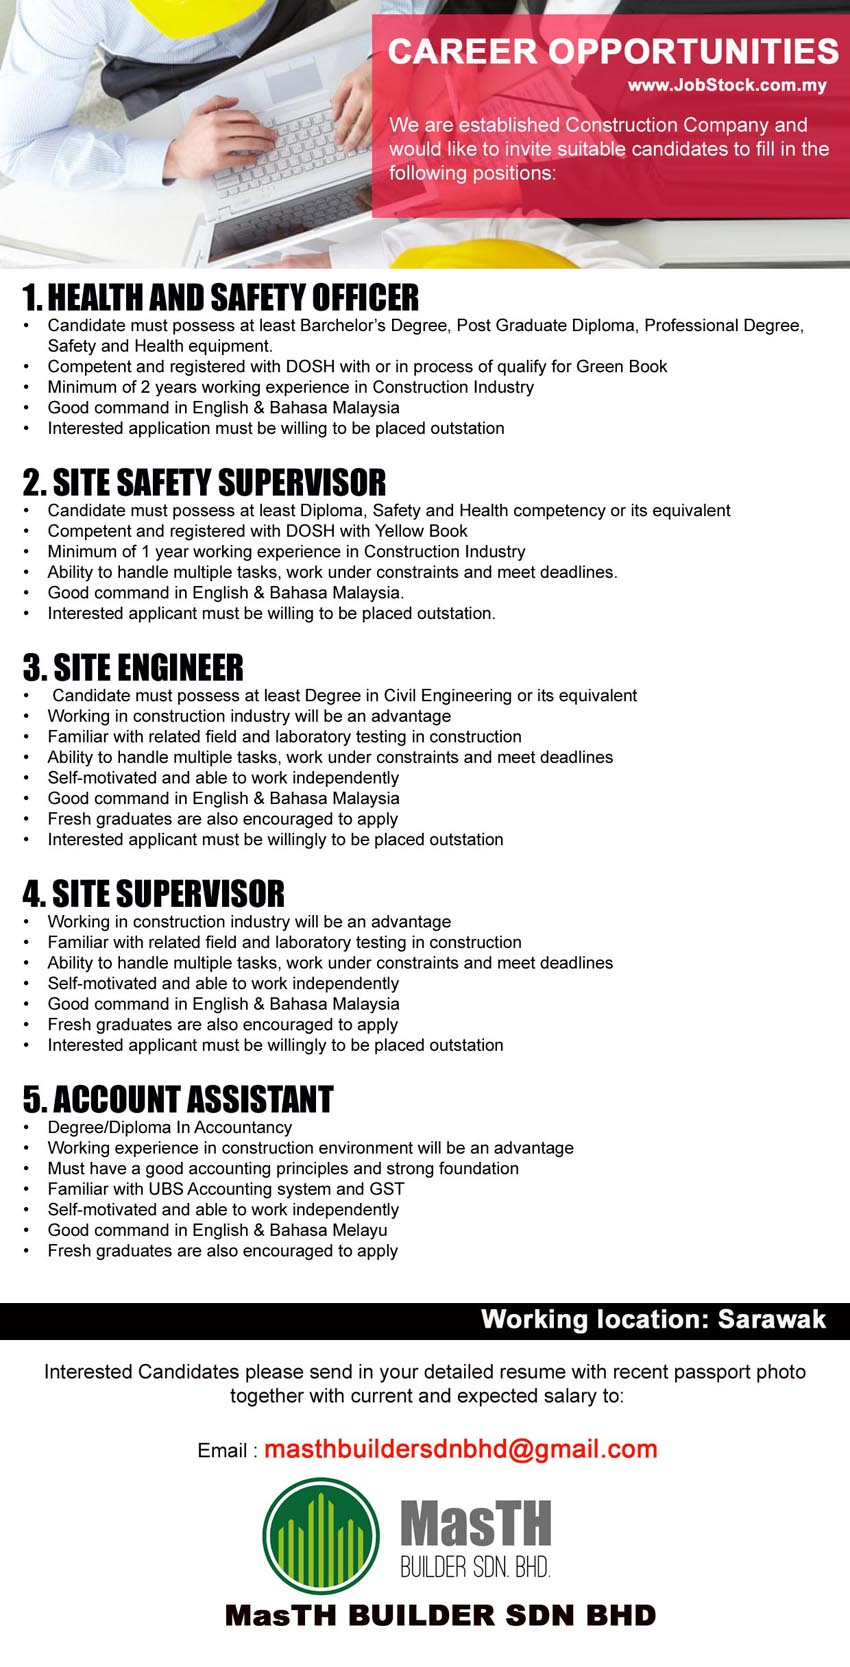 Masth Builder Sdn Bhd Jobs Miricommunity Net